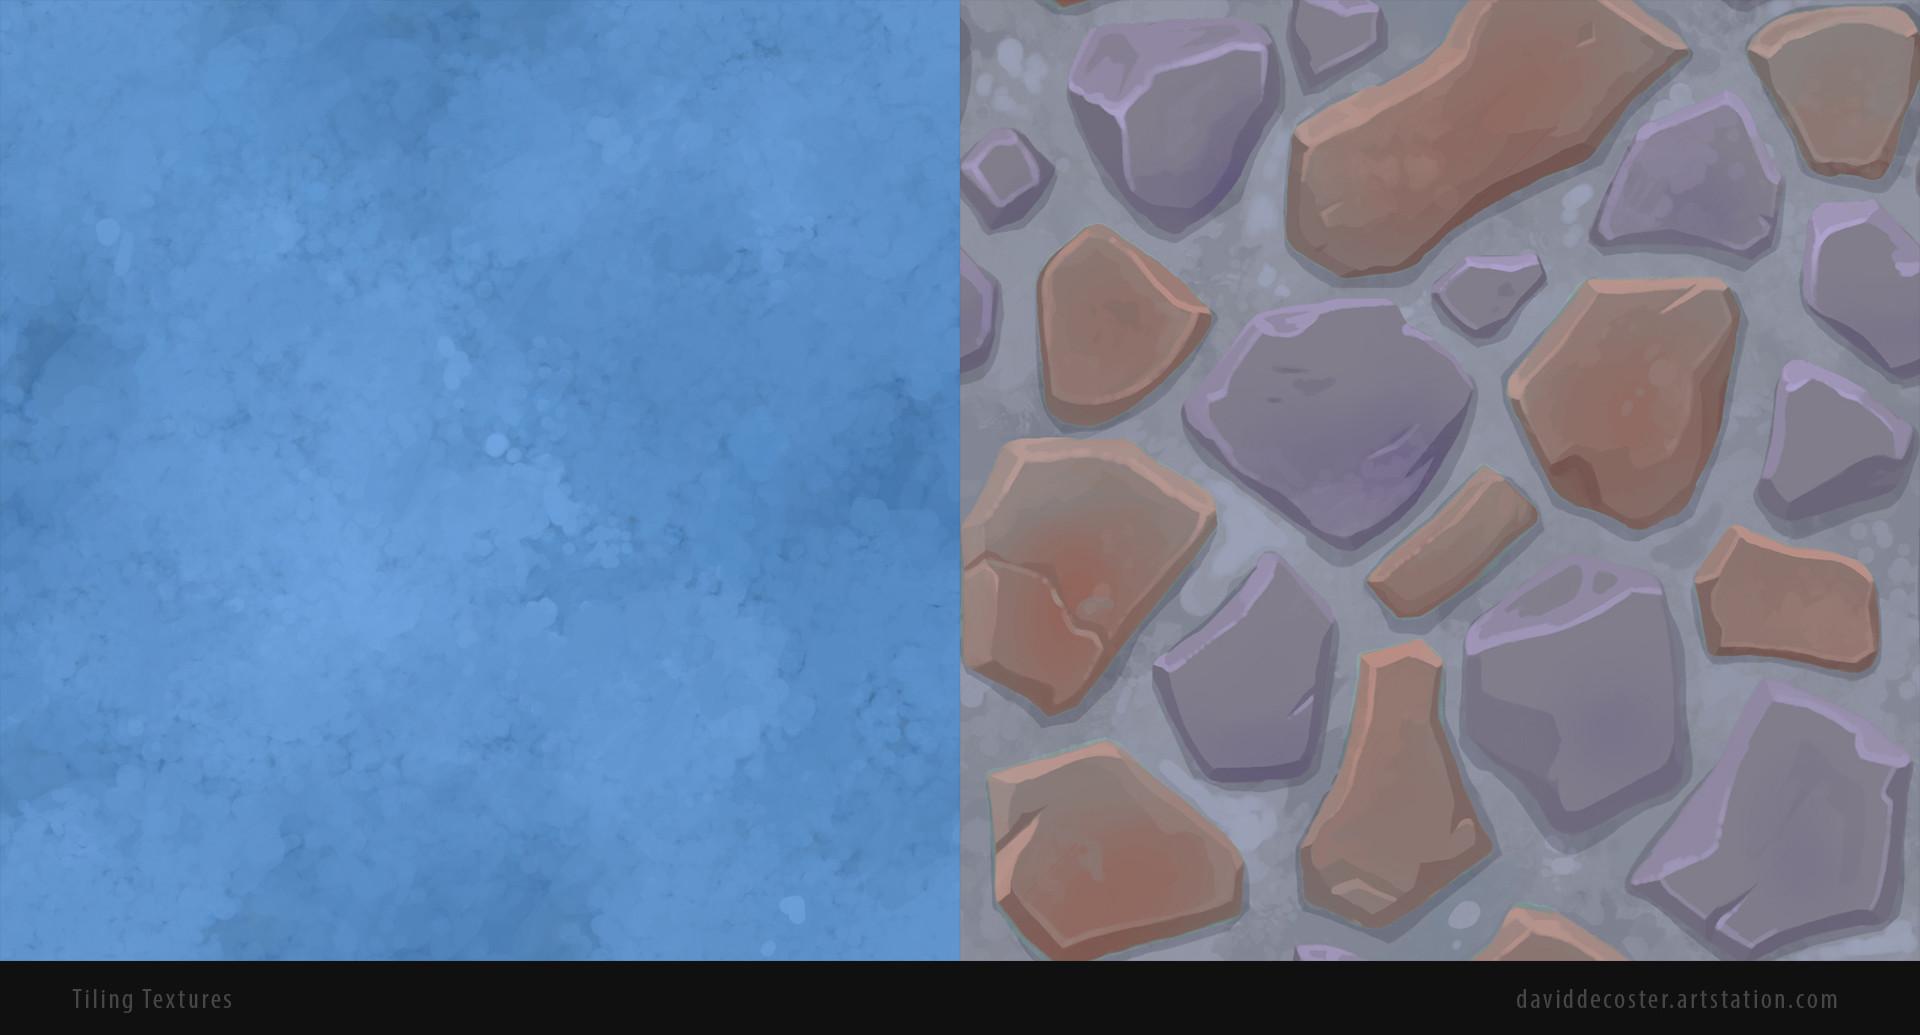 David decoster decoster tiling textures 02